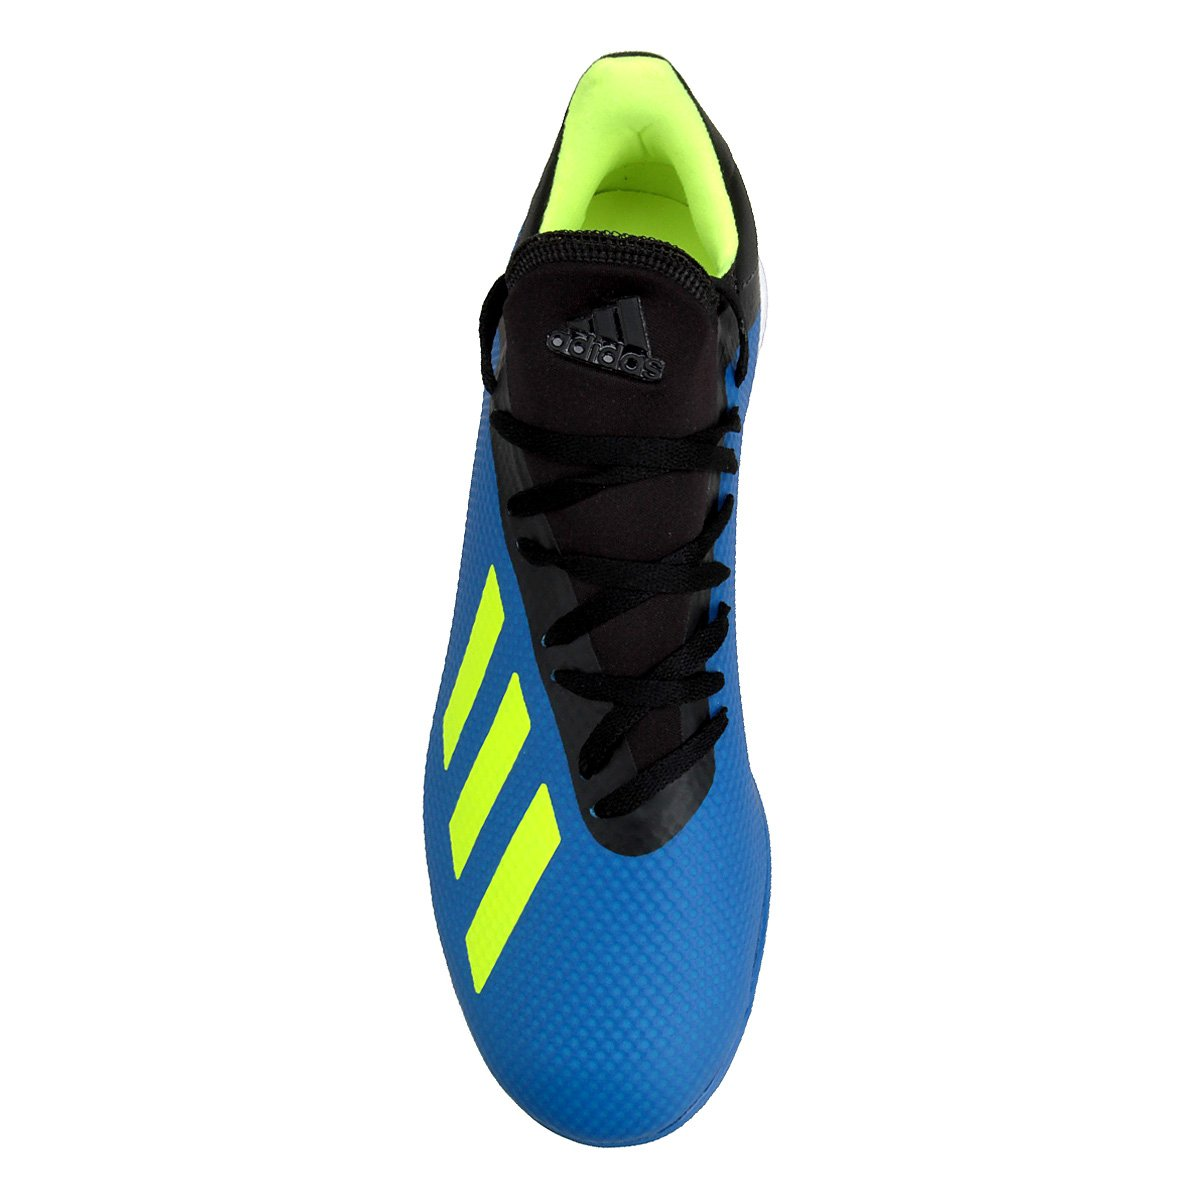 Chuteira Society Adidas X Tango 18 3 TF - Azul e Preto - Compre ... 51735fa07f6f3